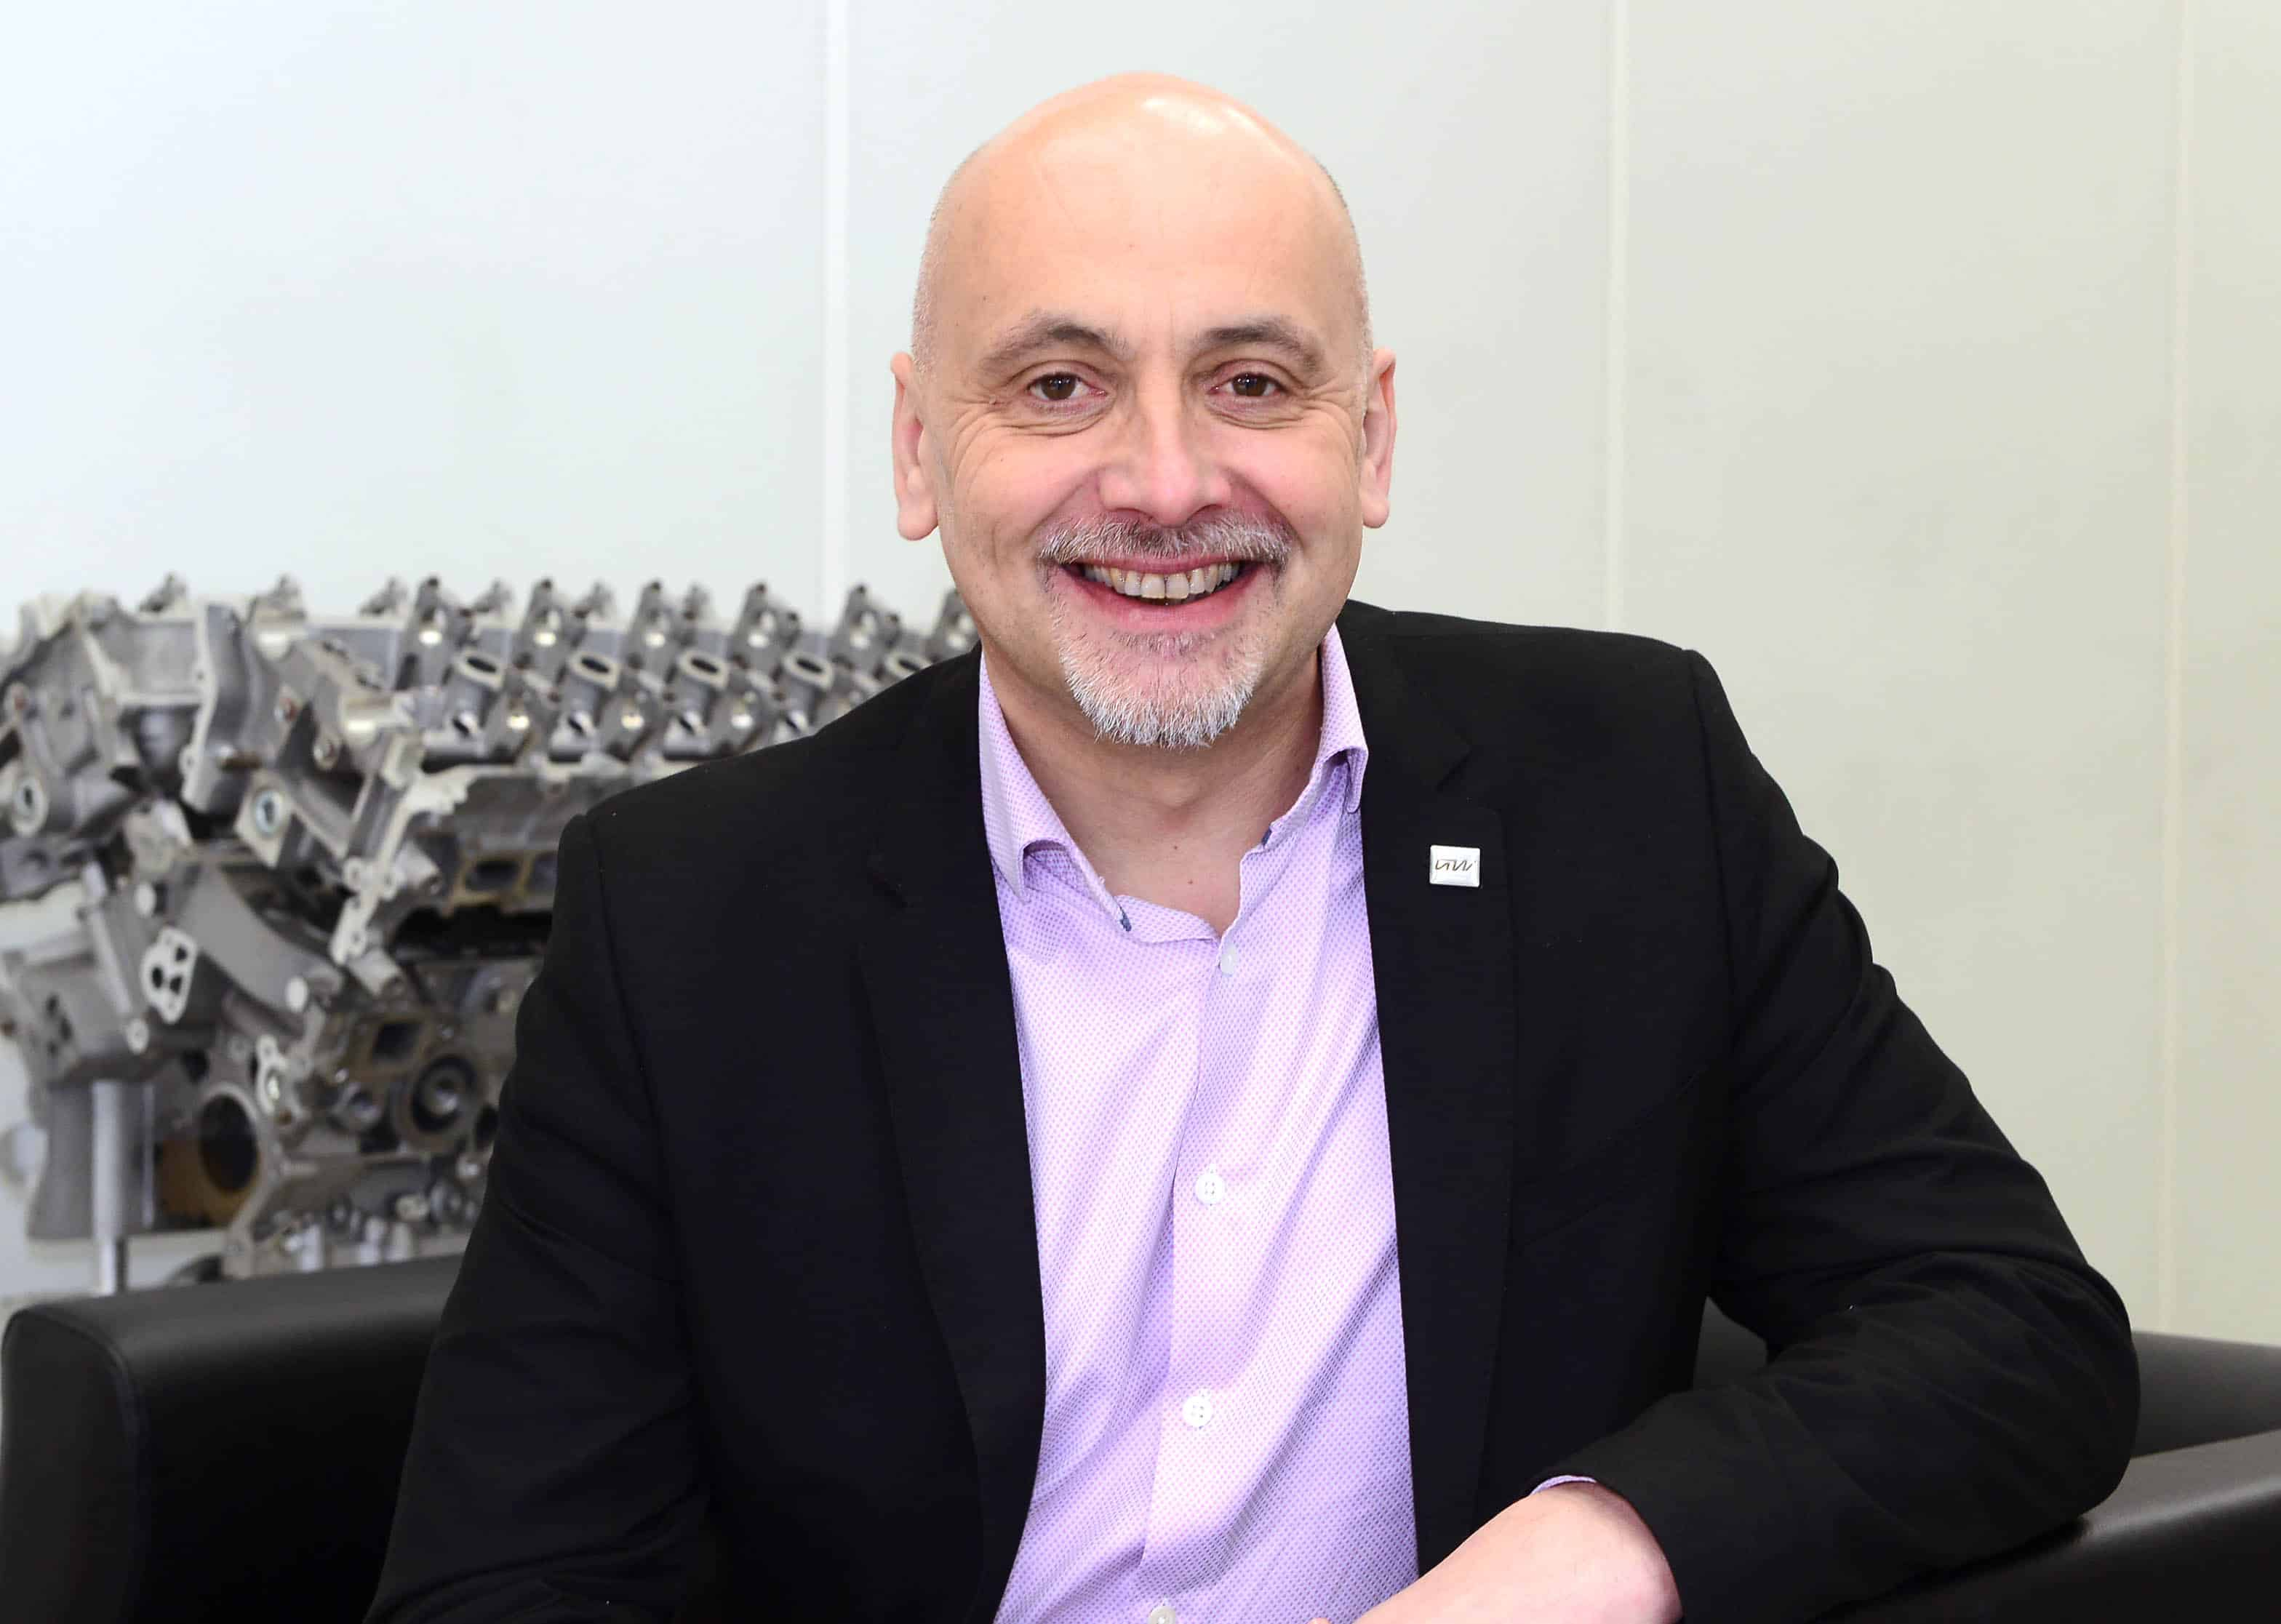 G'&W head of engineering Keith Denholm